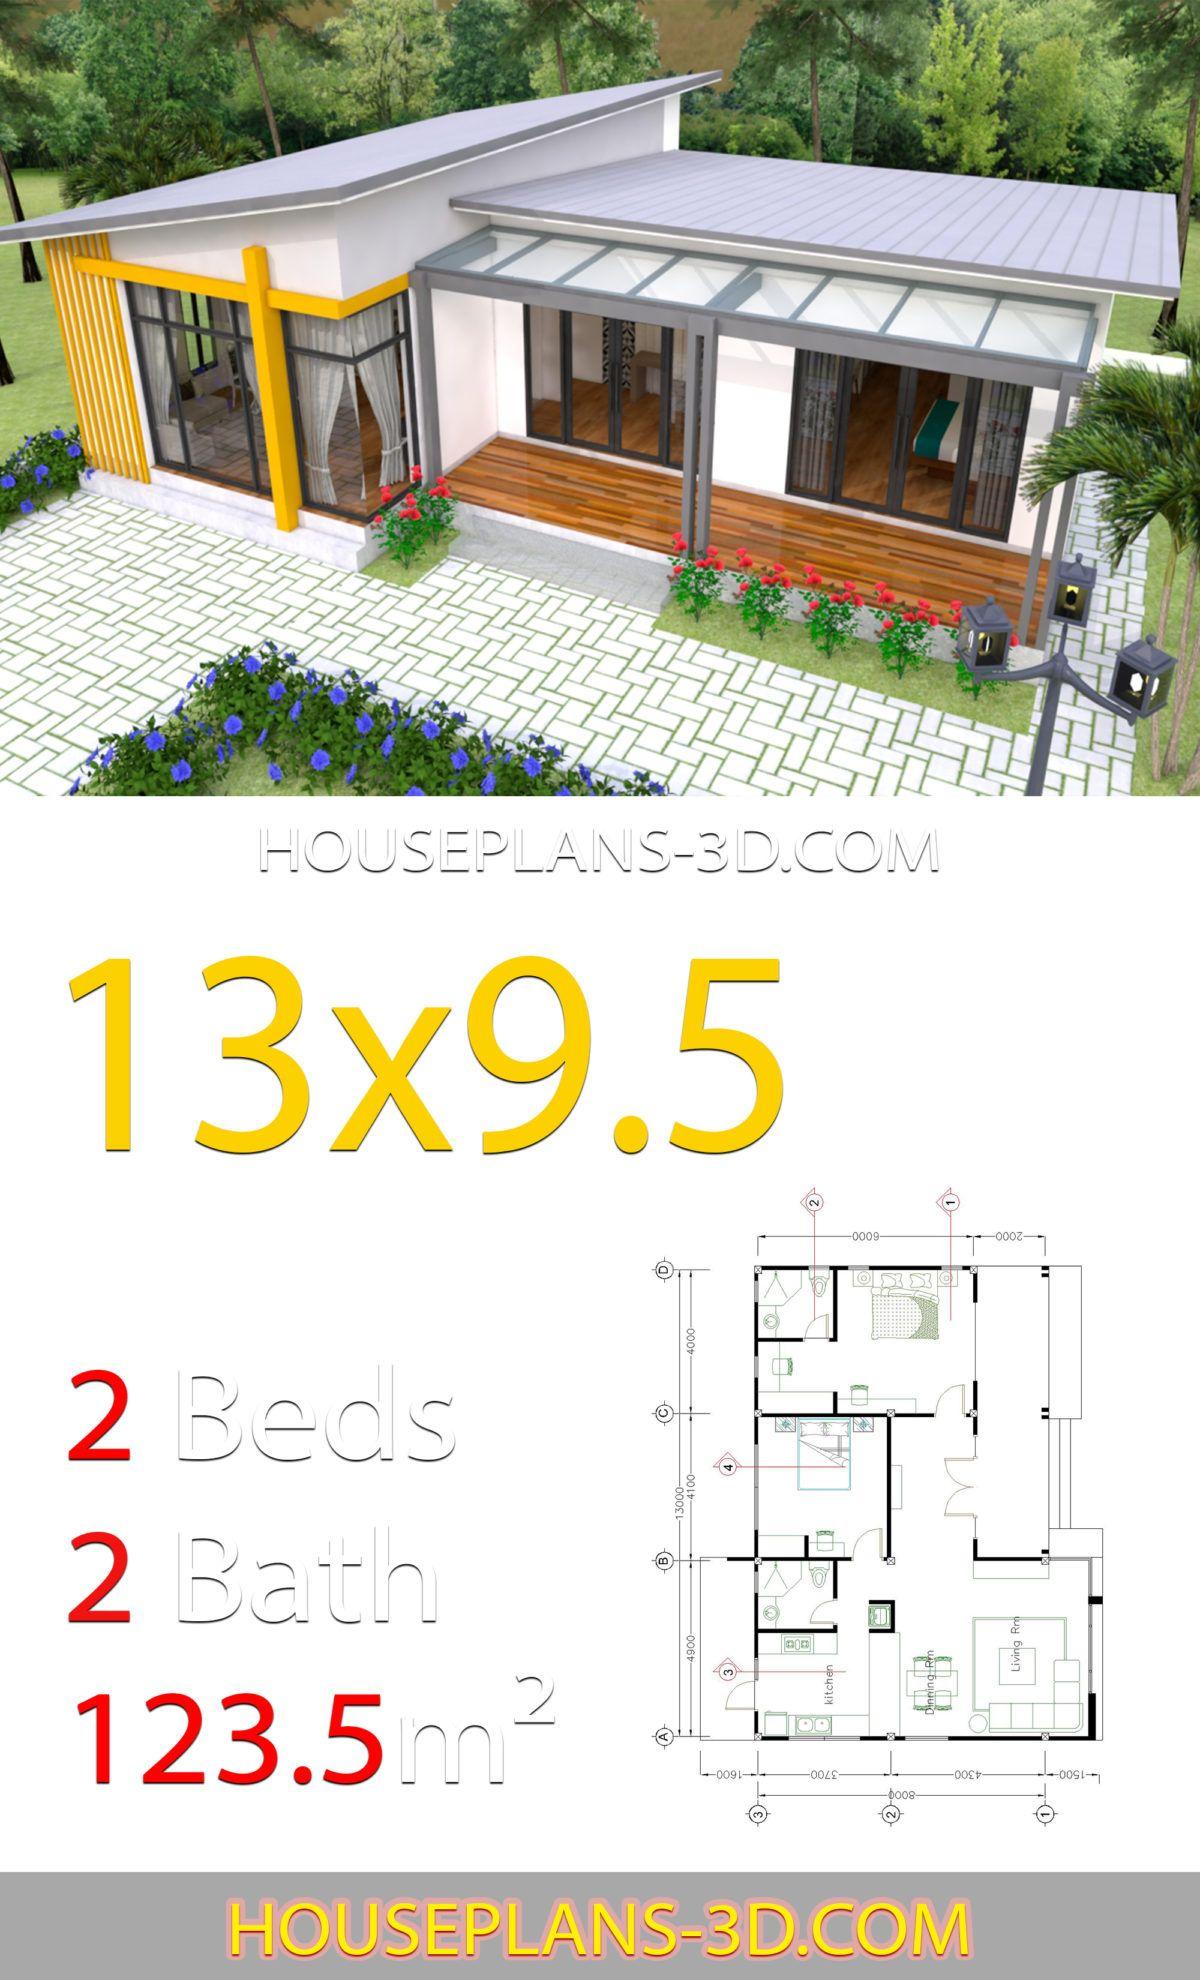 House Design 13x9 5 With 2 Bedrooms Slop Roof House Plans 3d House Plans House Blueprints Container House Plans